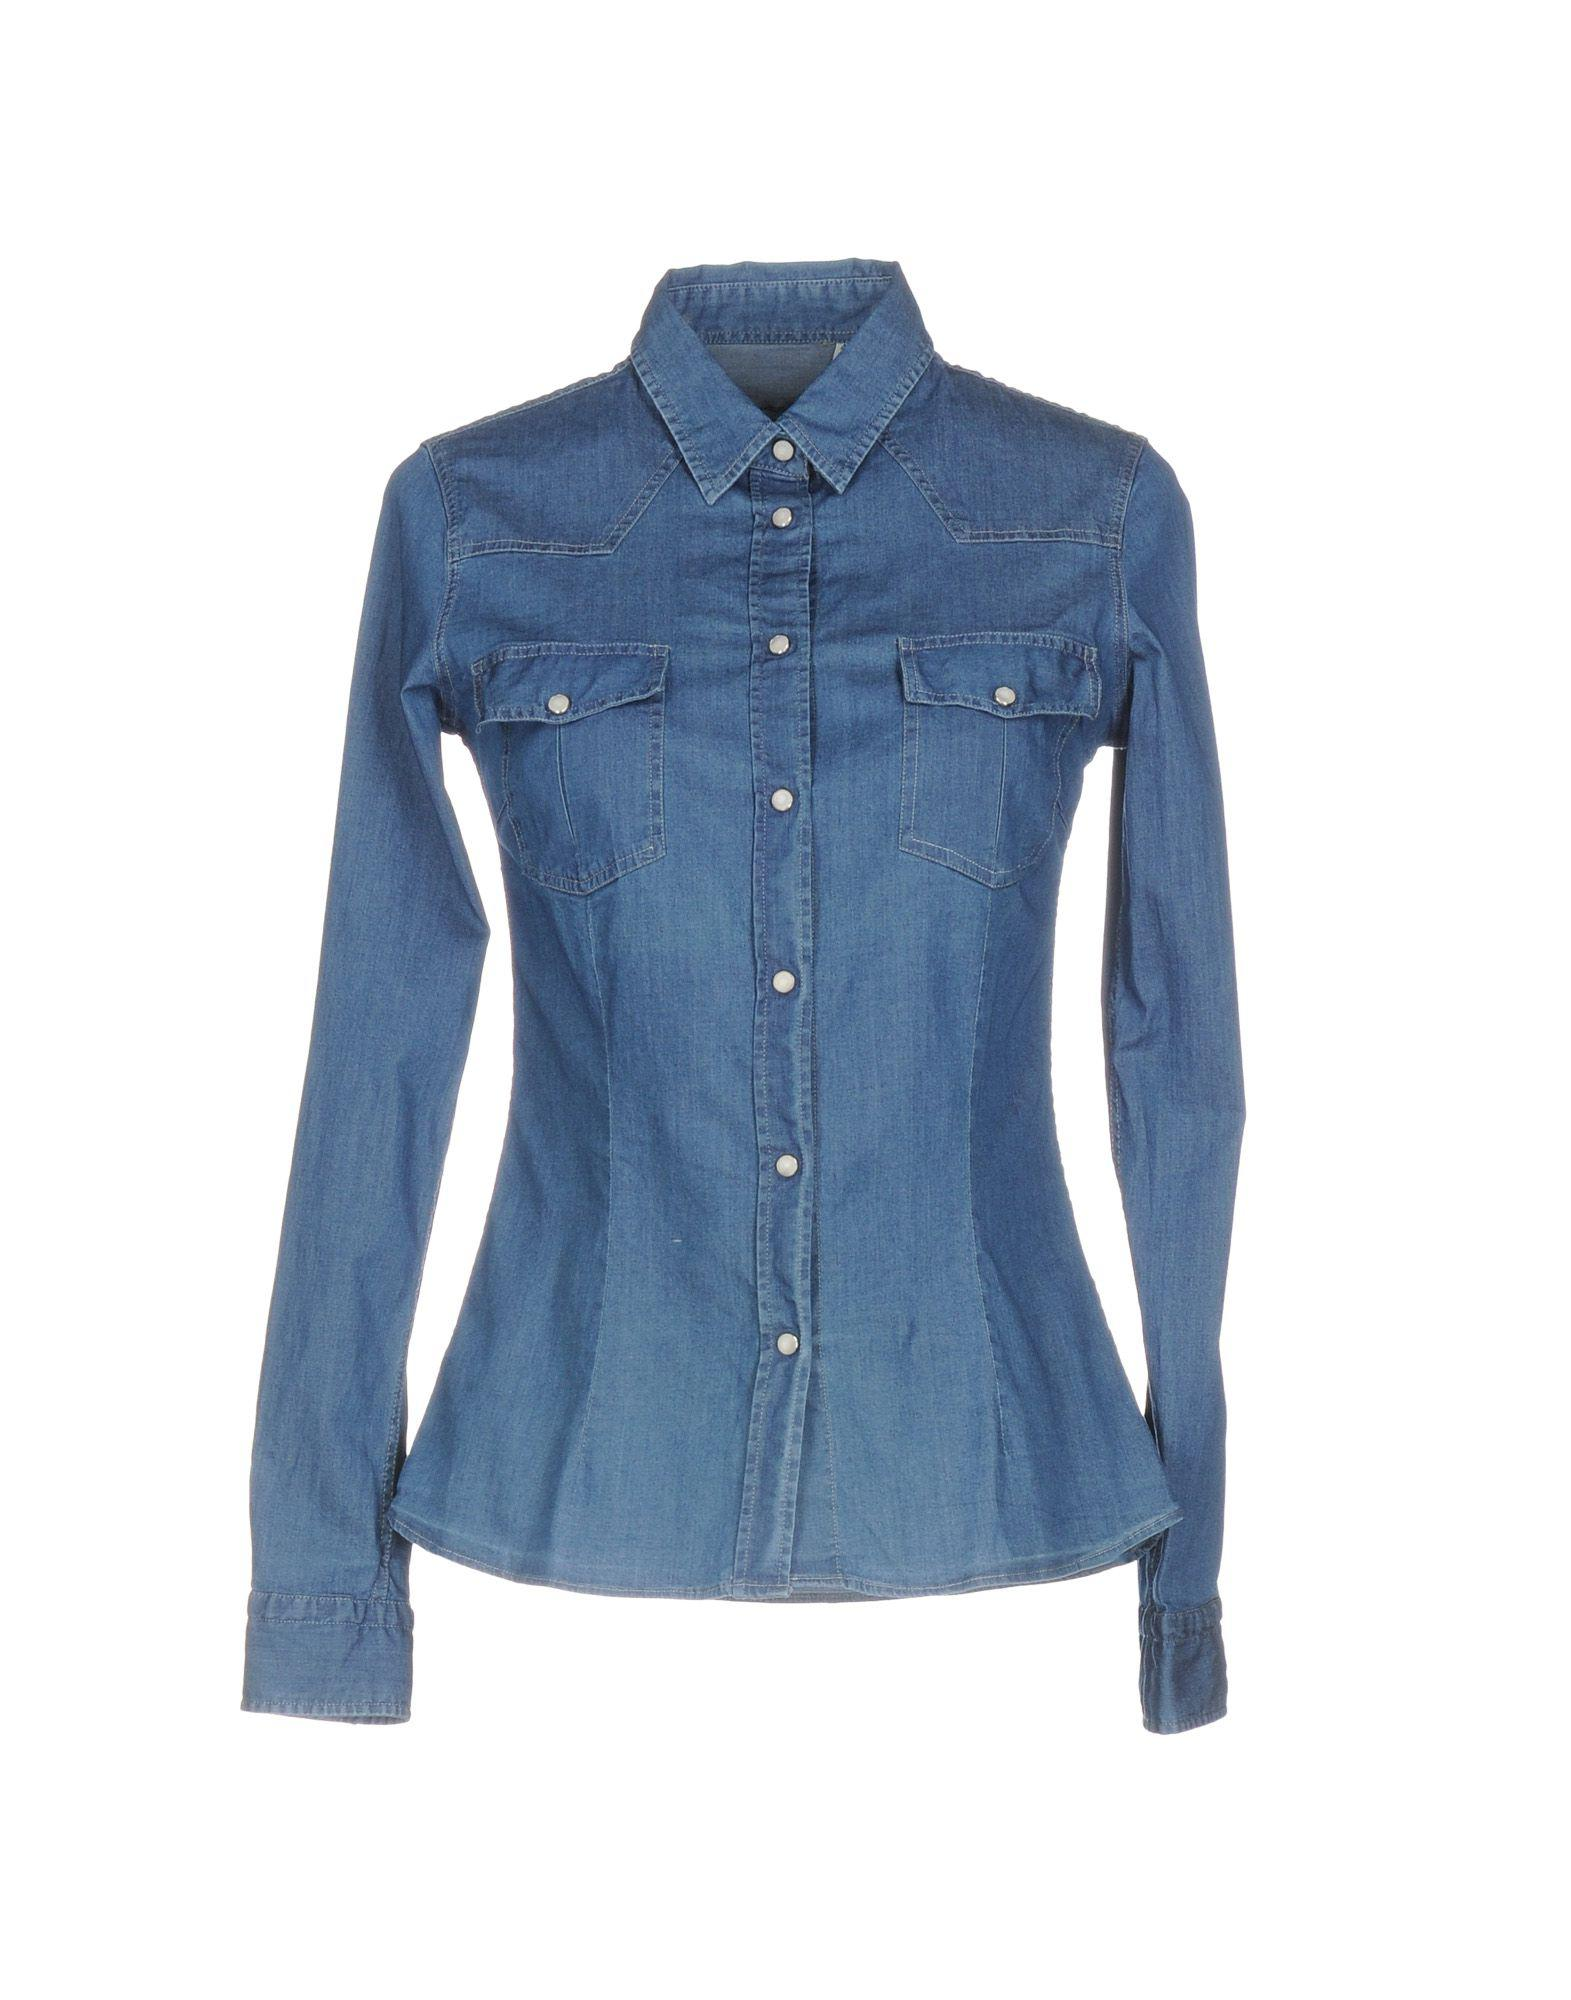 DENIM - Denim shirts Camicettasnob Cheap Sale Finishline Discount Cheap Sale For Nice xybh1